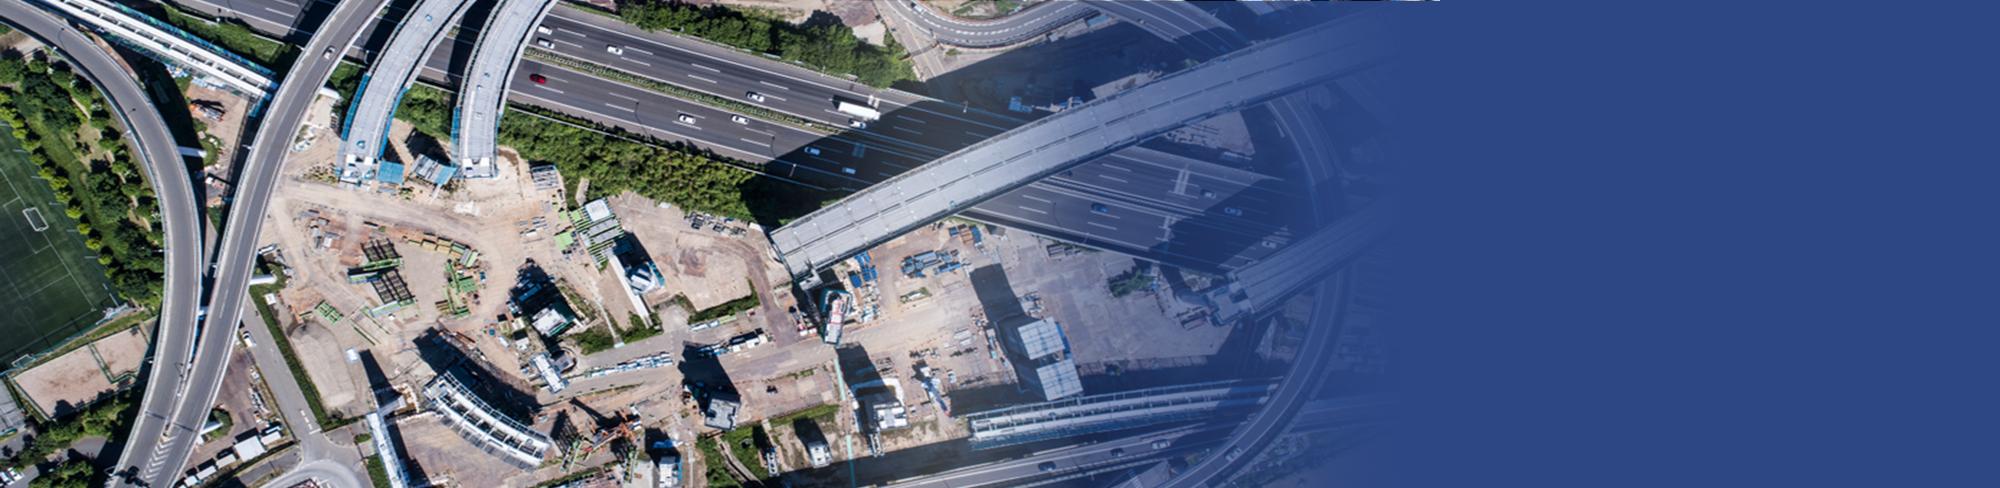 Infrastructure Header Image.png